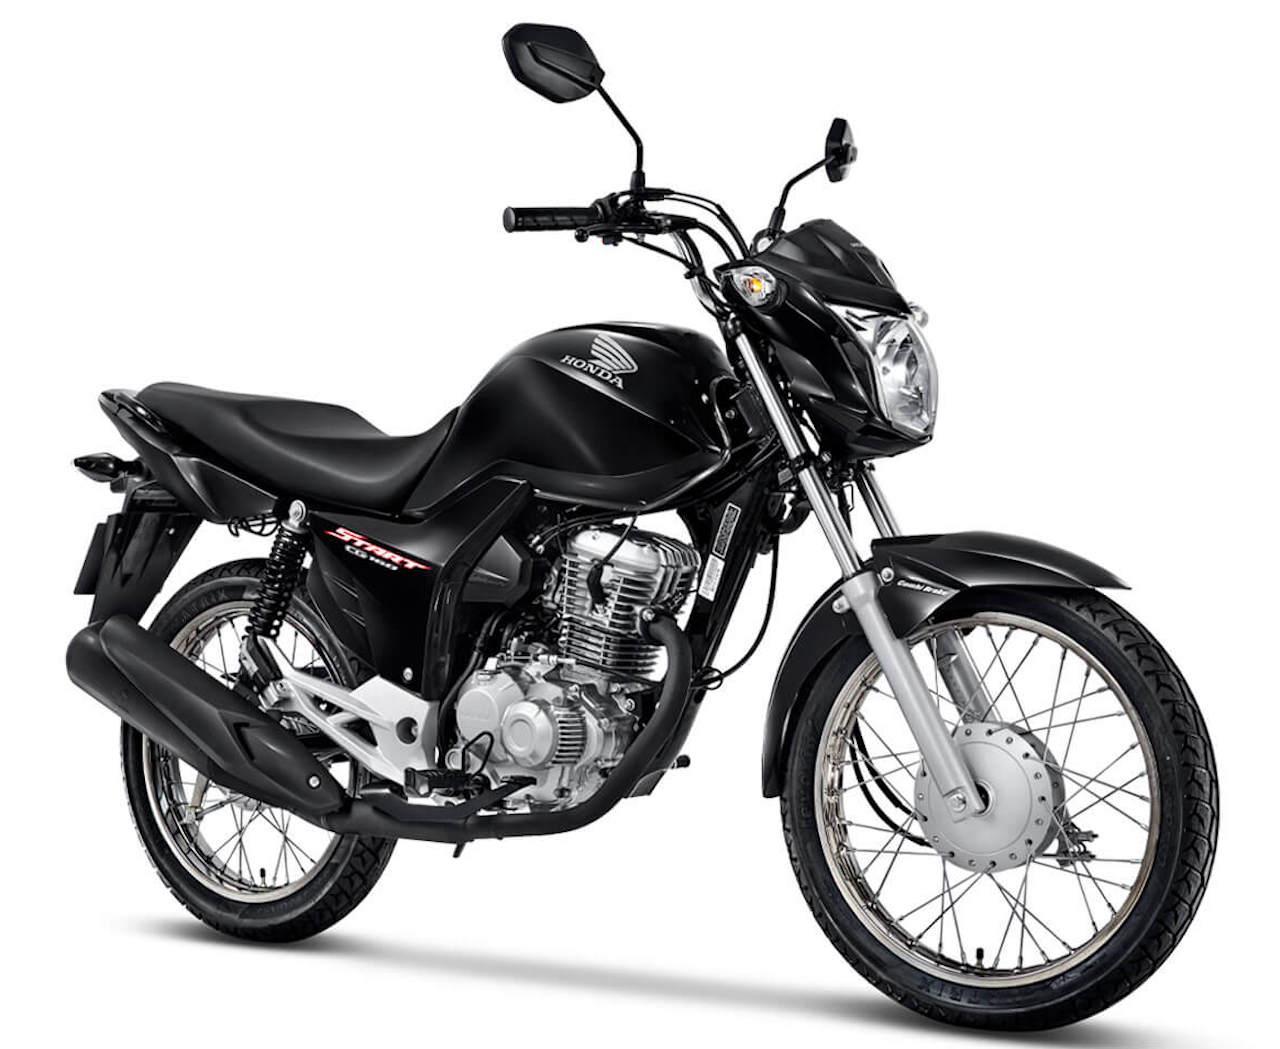 画像: Honda CG160 Start